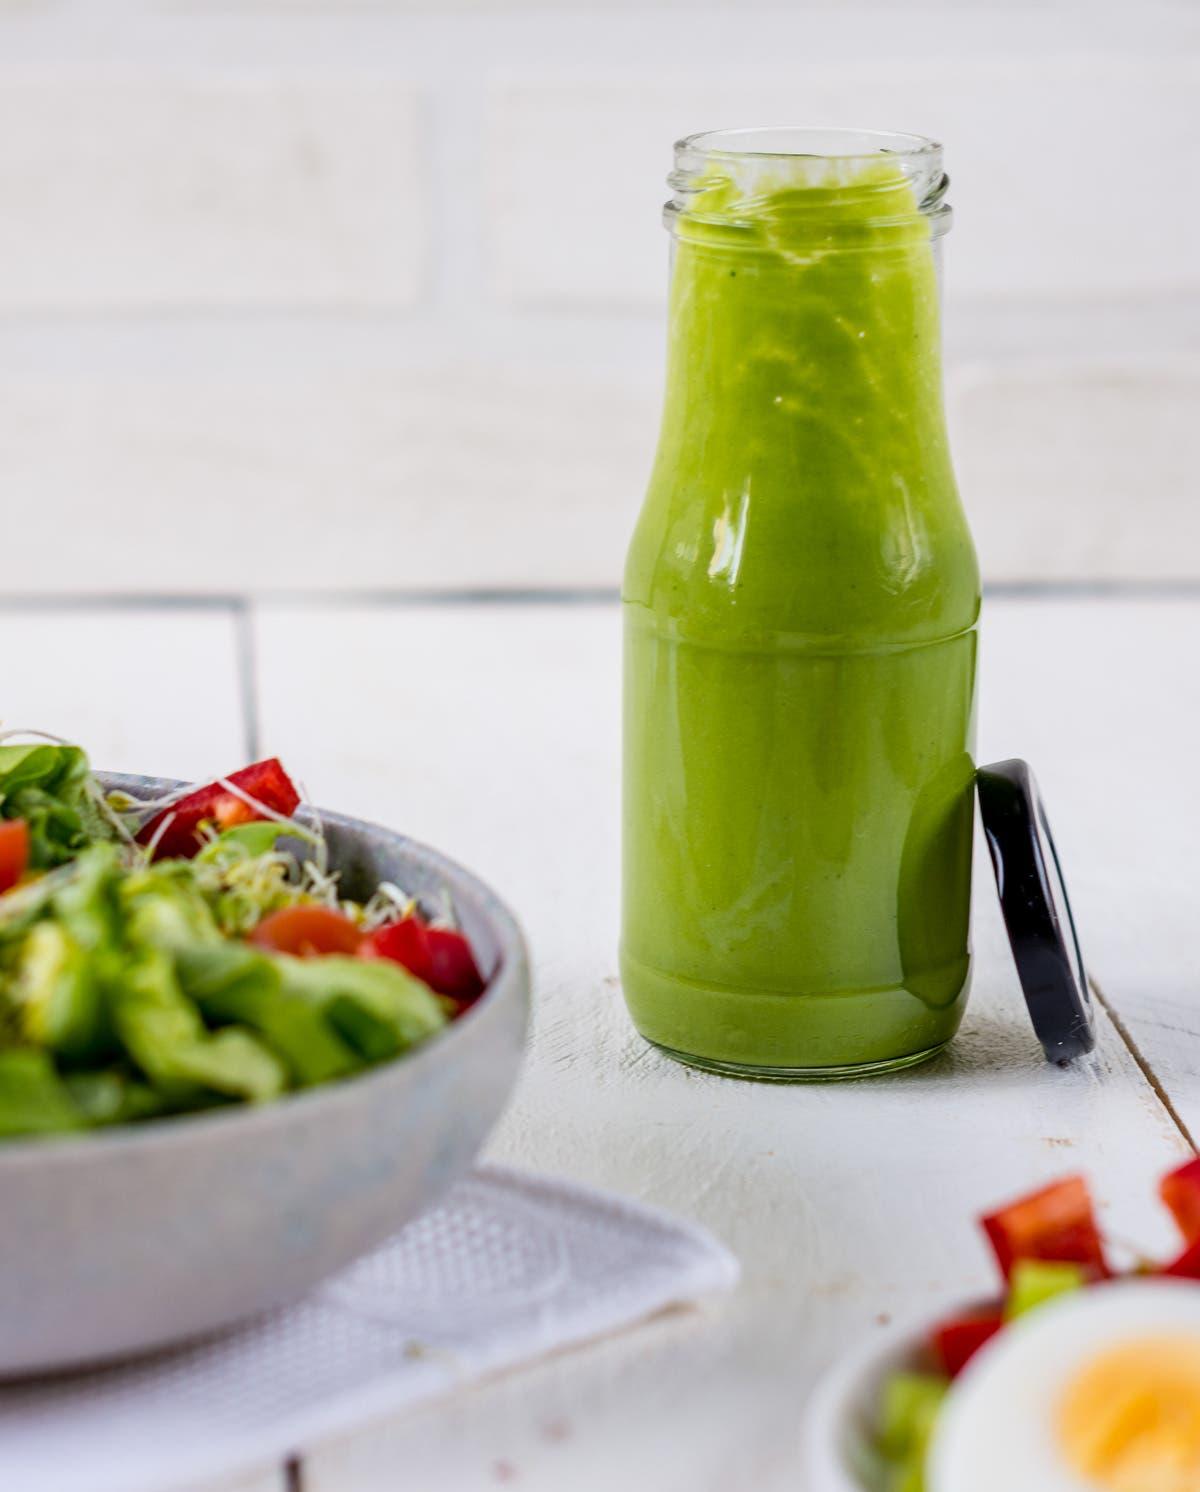 Offene Flasche mit grünem Salatdressing.